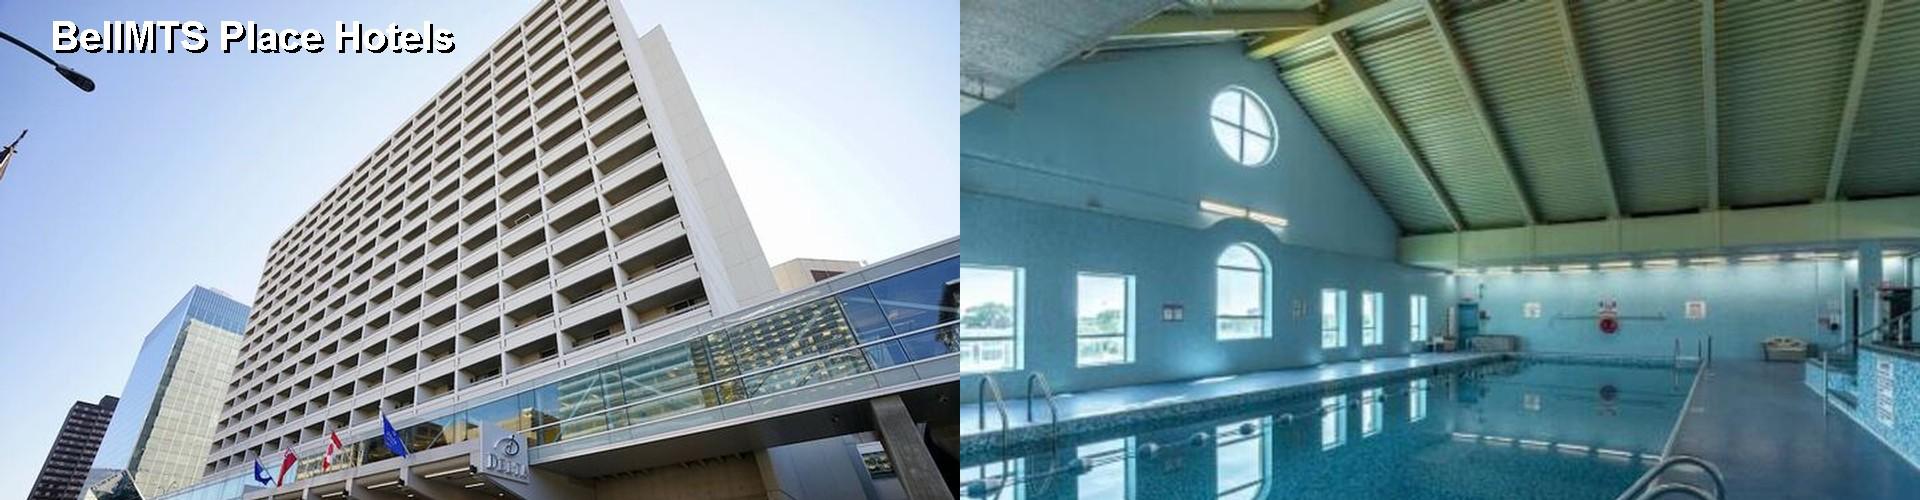 MTS Centre  BEST WESTERN PLUS Downtown Winnipeg